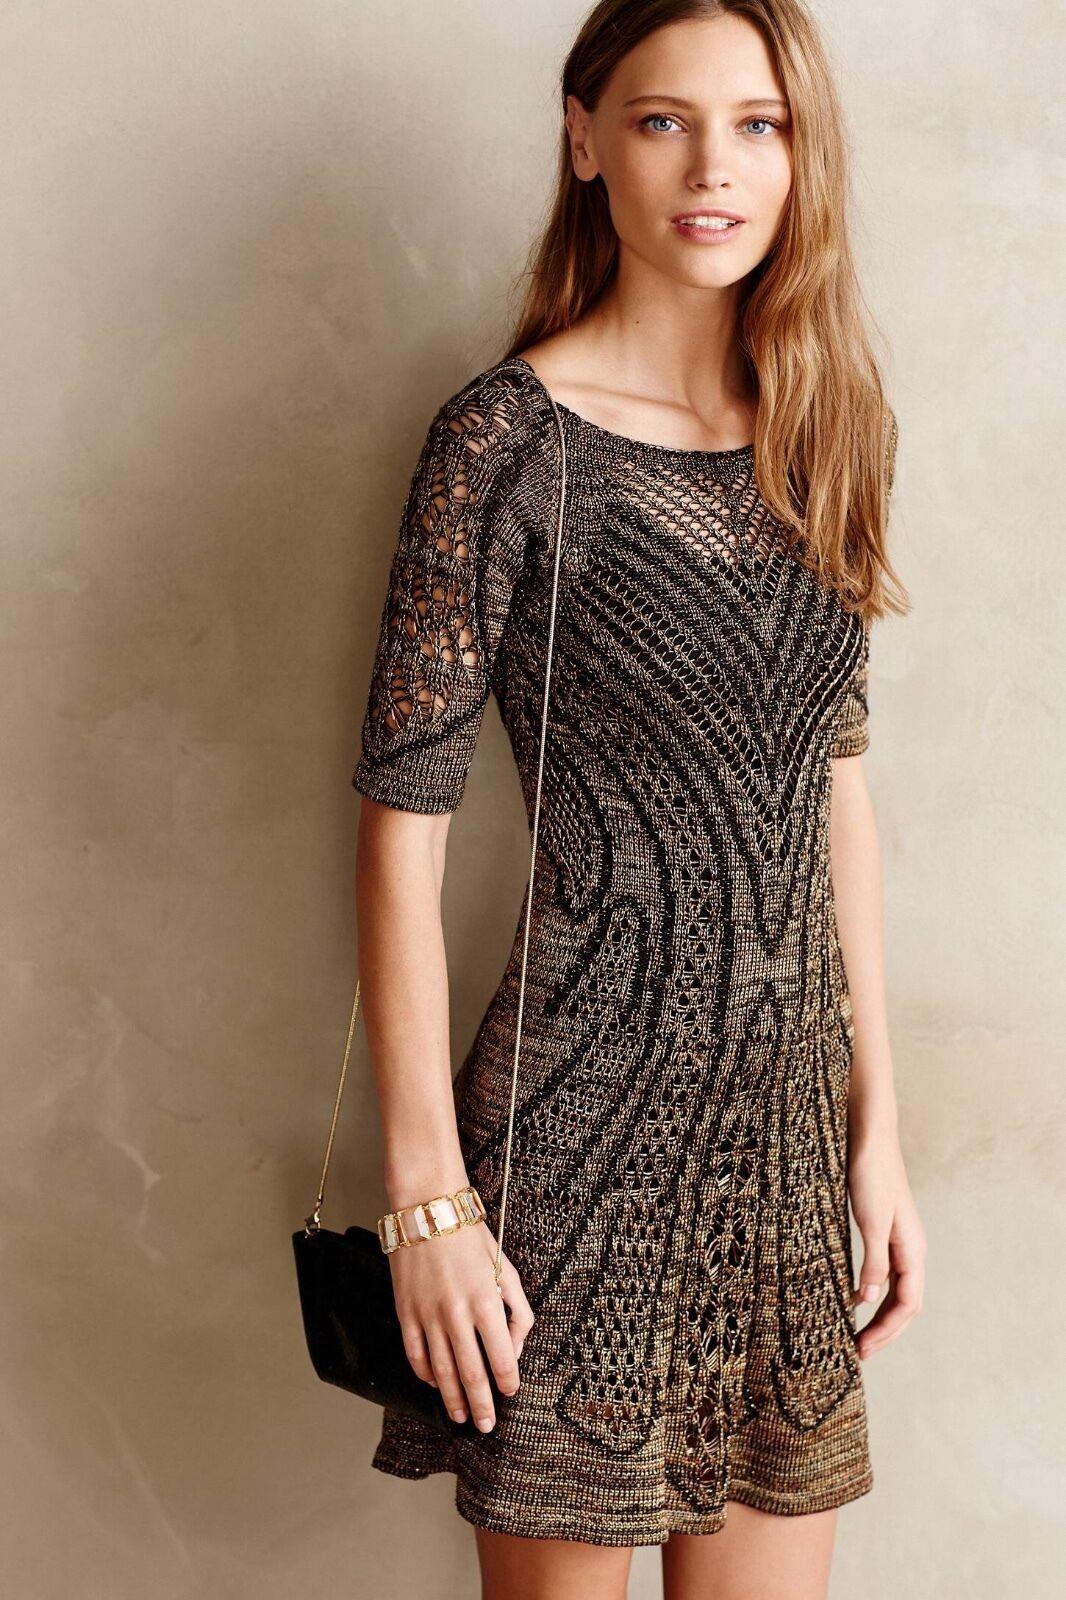 NEW Anthropologie  CECILIA PRADO Obrizus Dress Size Medium M